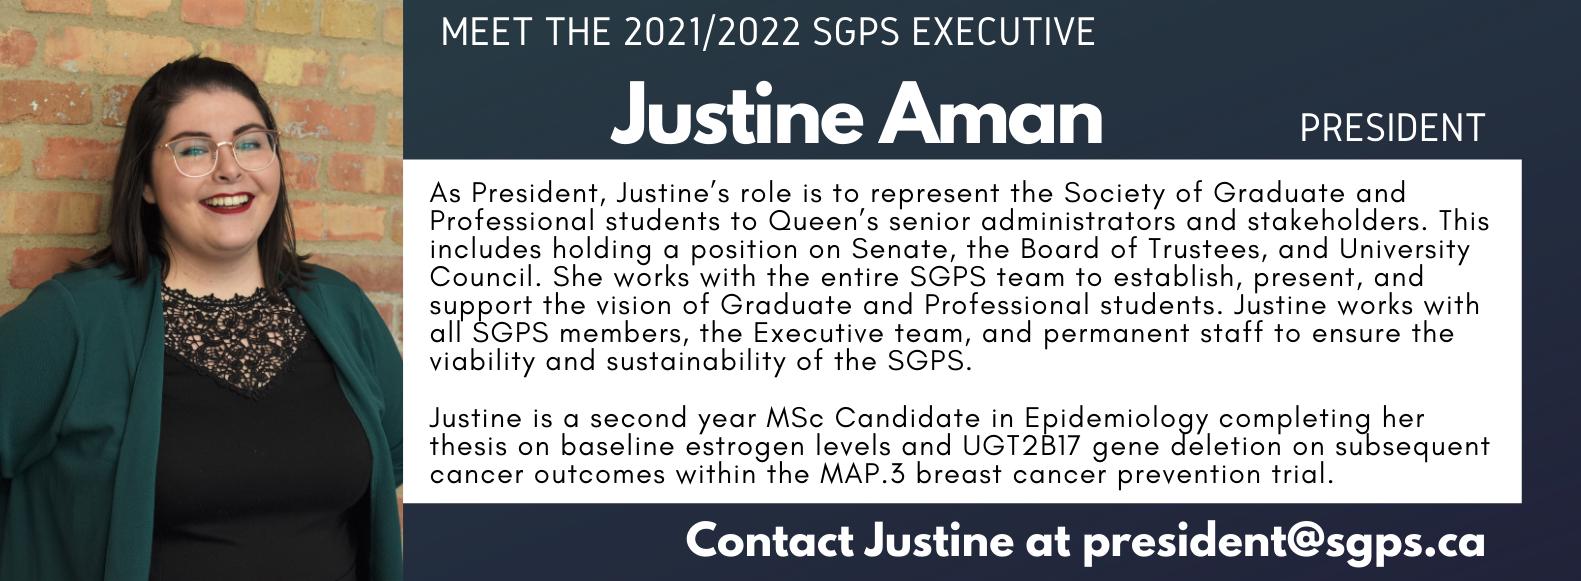 JustineBanner2122